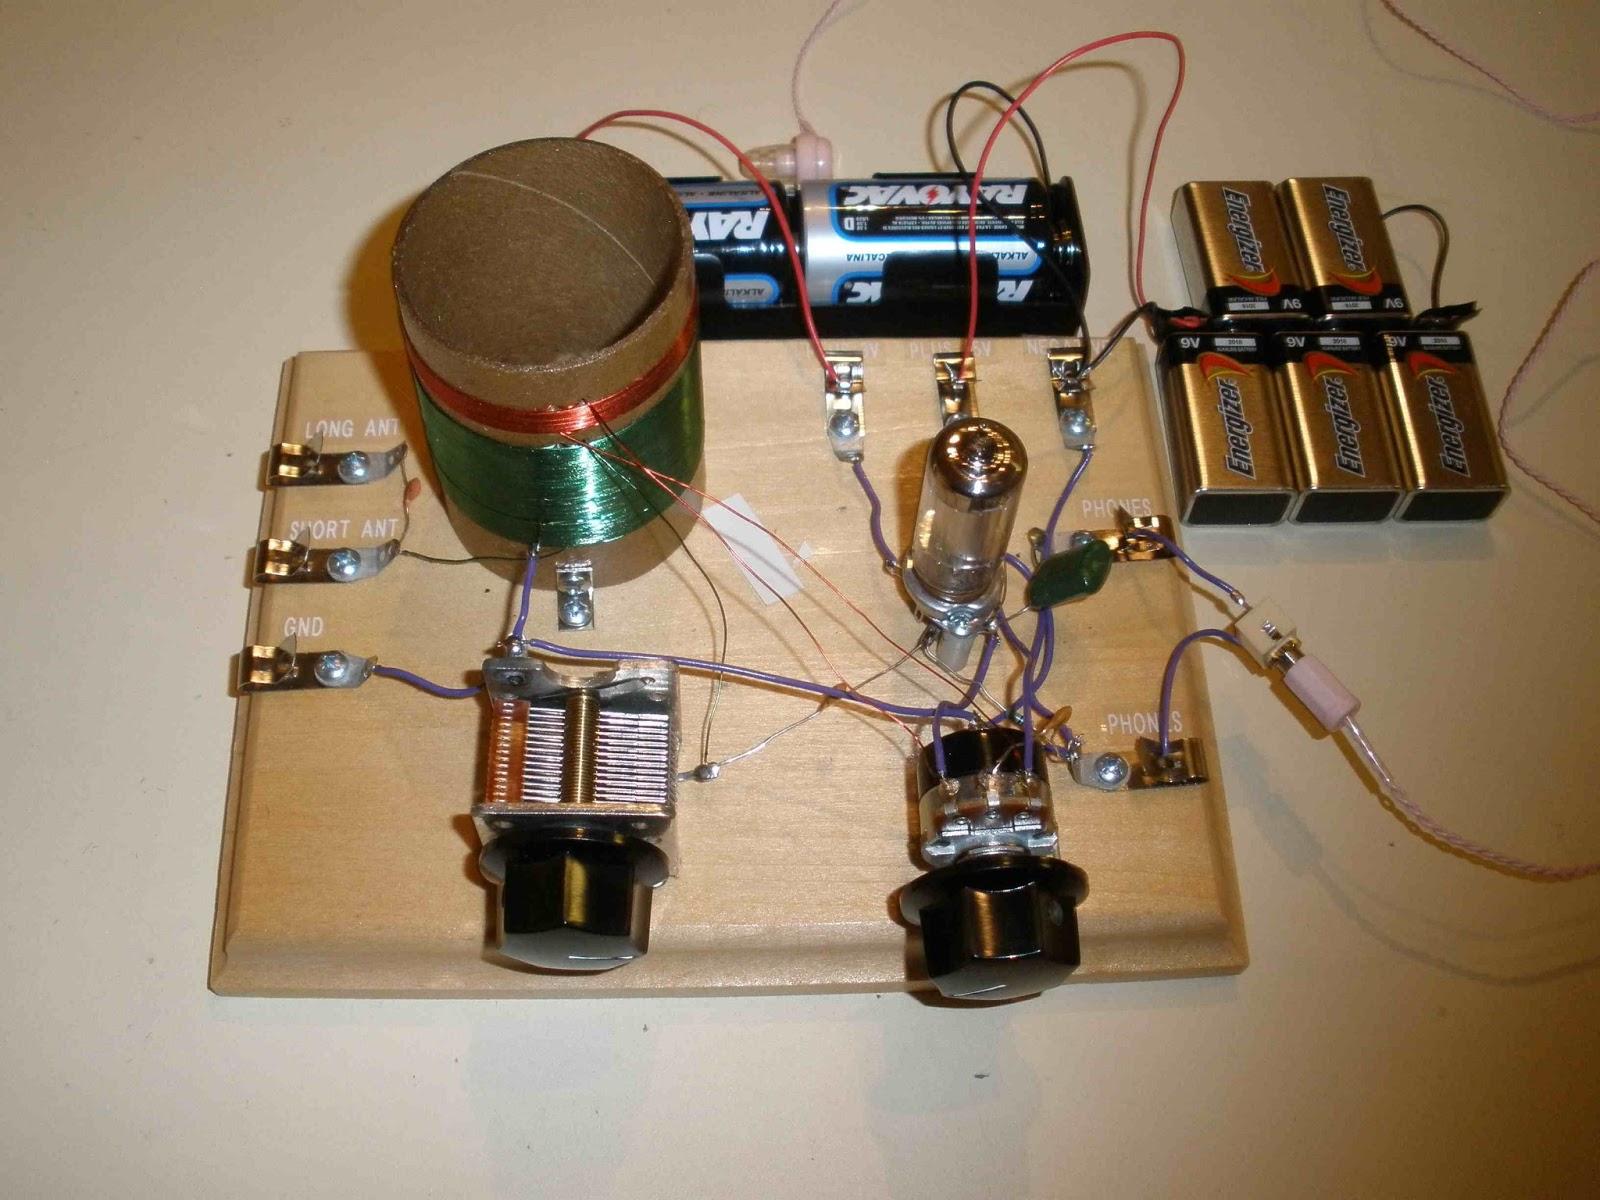 YmBNYssMyxs additionally Regenerative Radio Workshop moreover One Tube Radio Schematic furthermore K8tnds Take On The Kitchin Regen moreover 703124560543077788. on armstrong one tube radio schematic